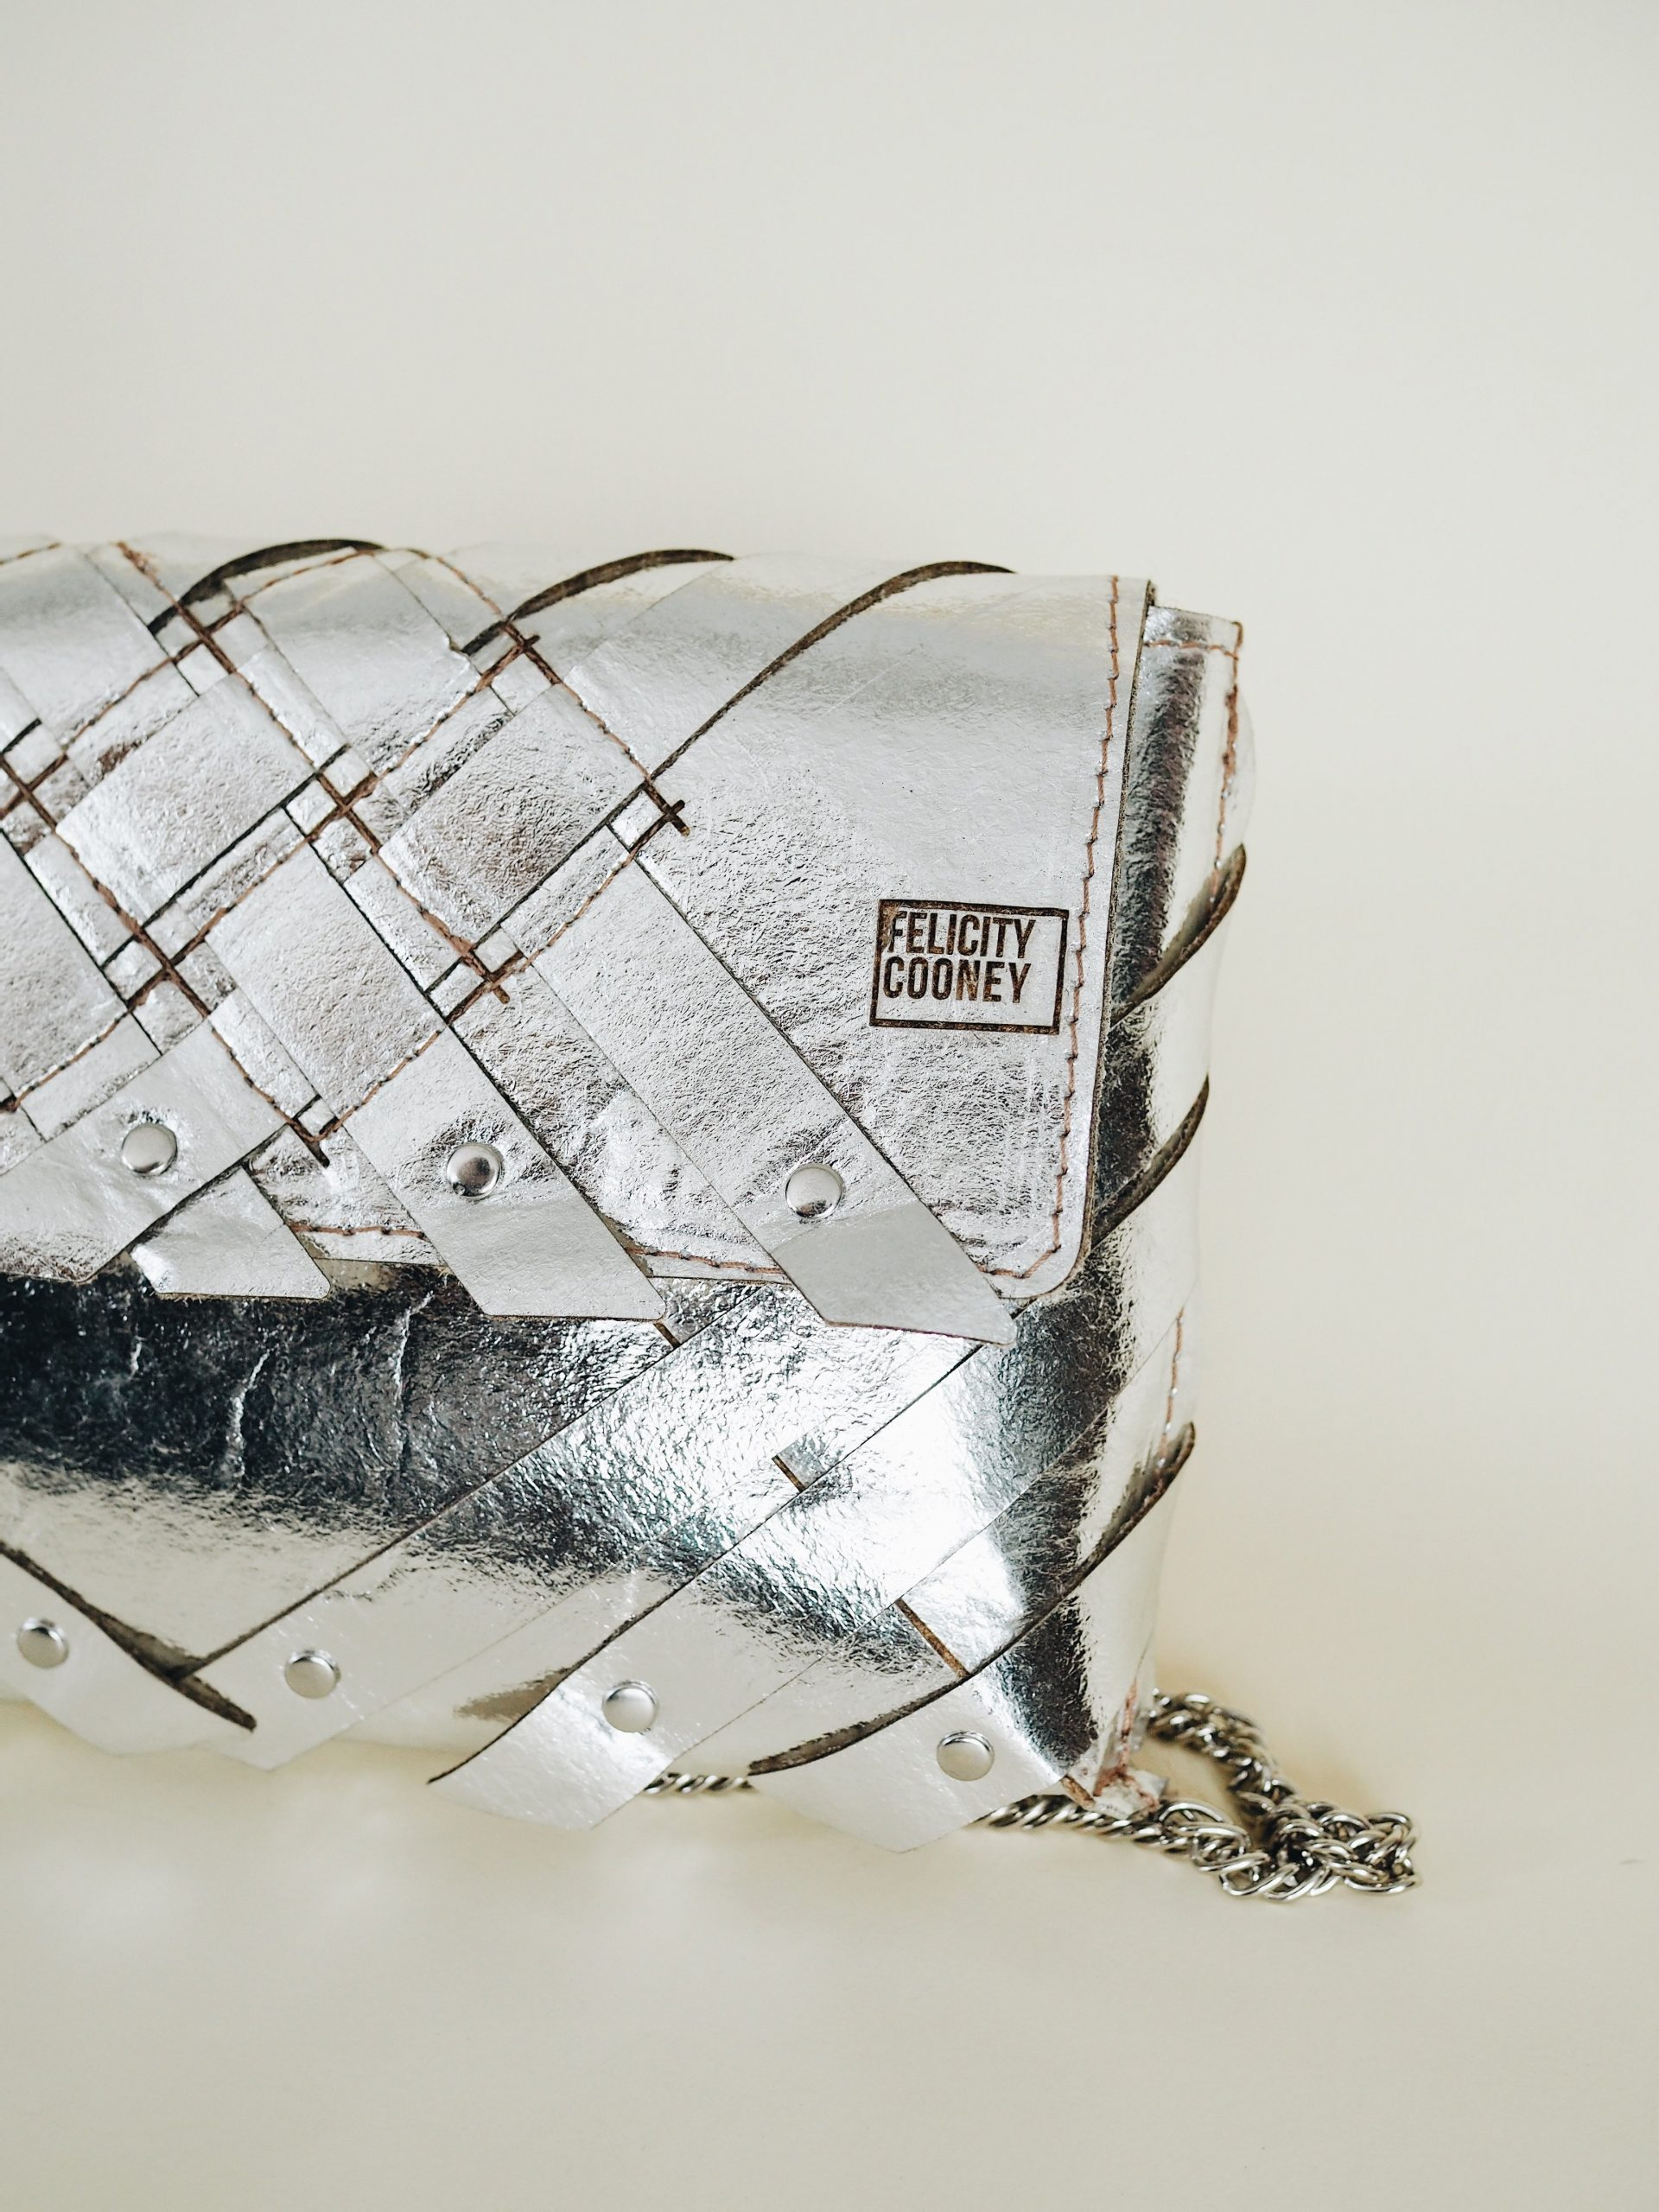 Felicity-Cooney-Pinatex-Bag-sustainable-fabrics